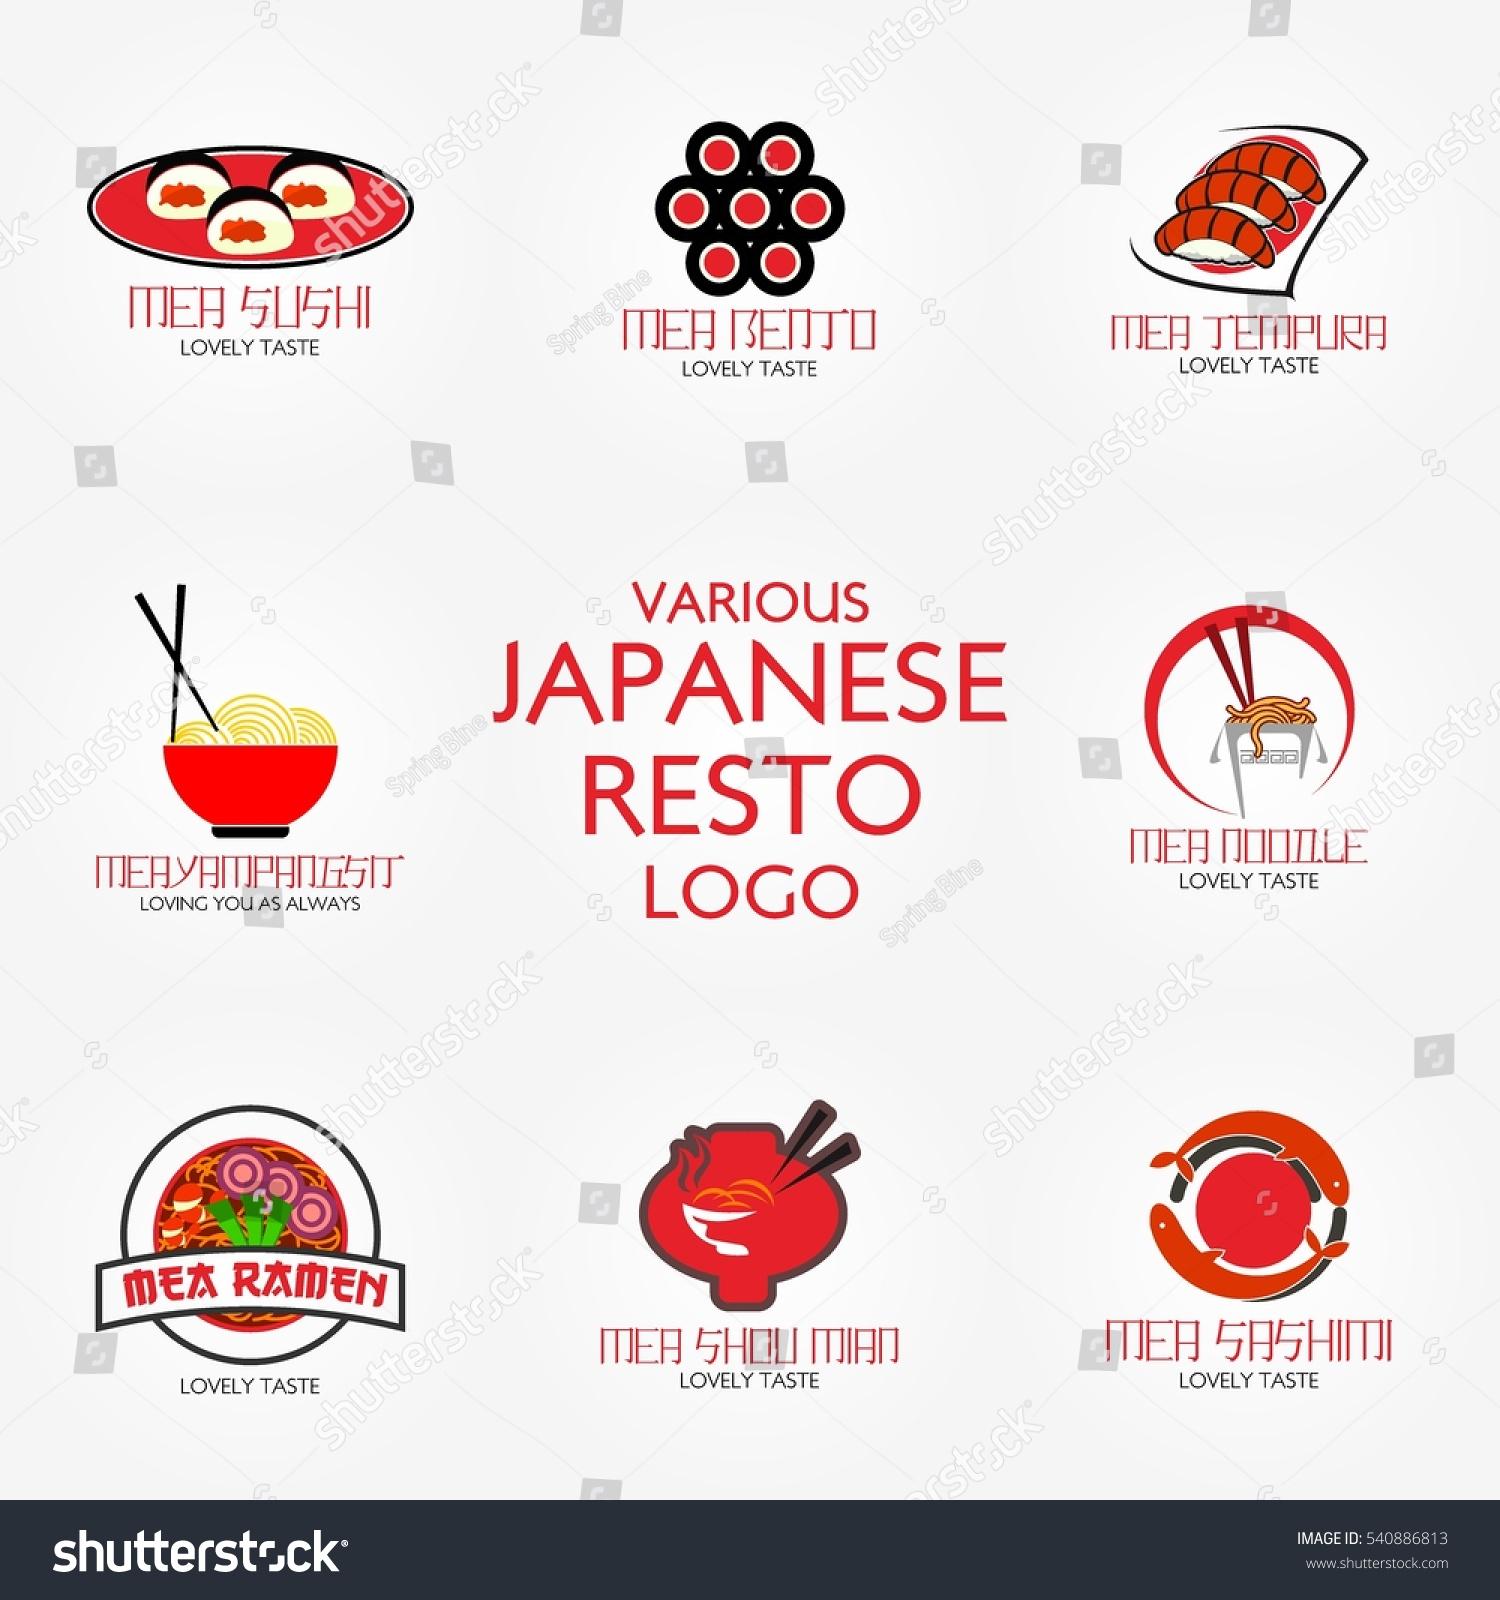 Traditional japanese food restaurant logo design stock